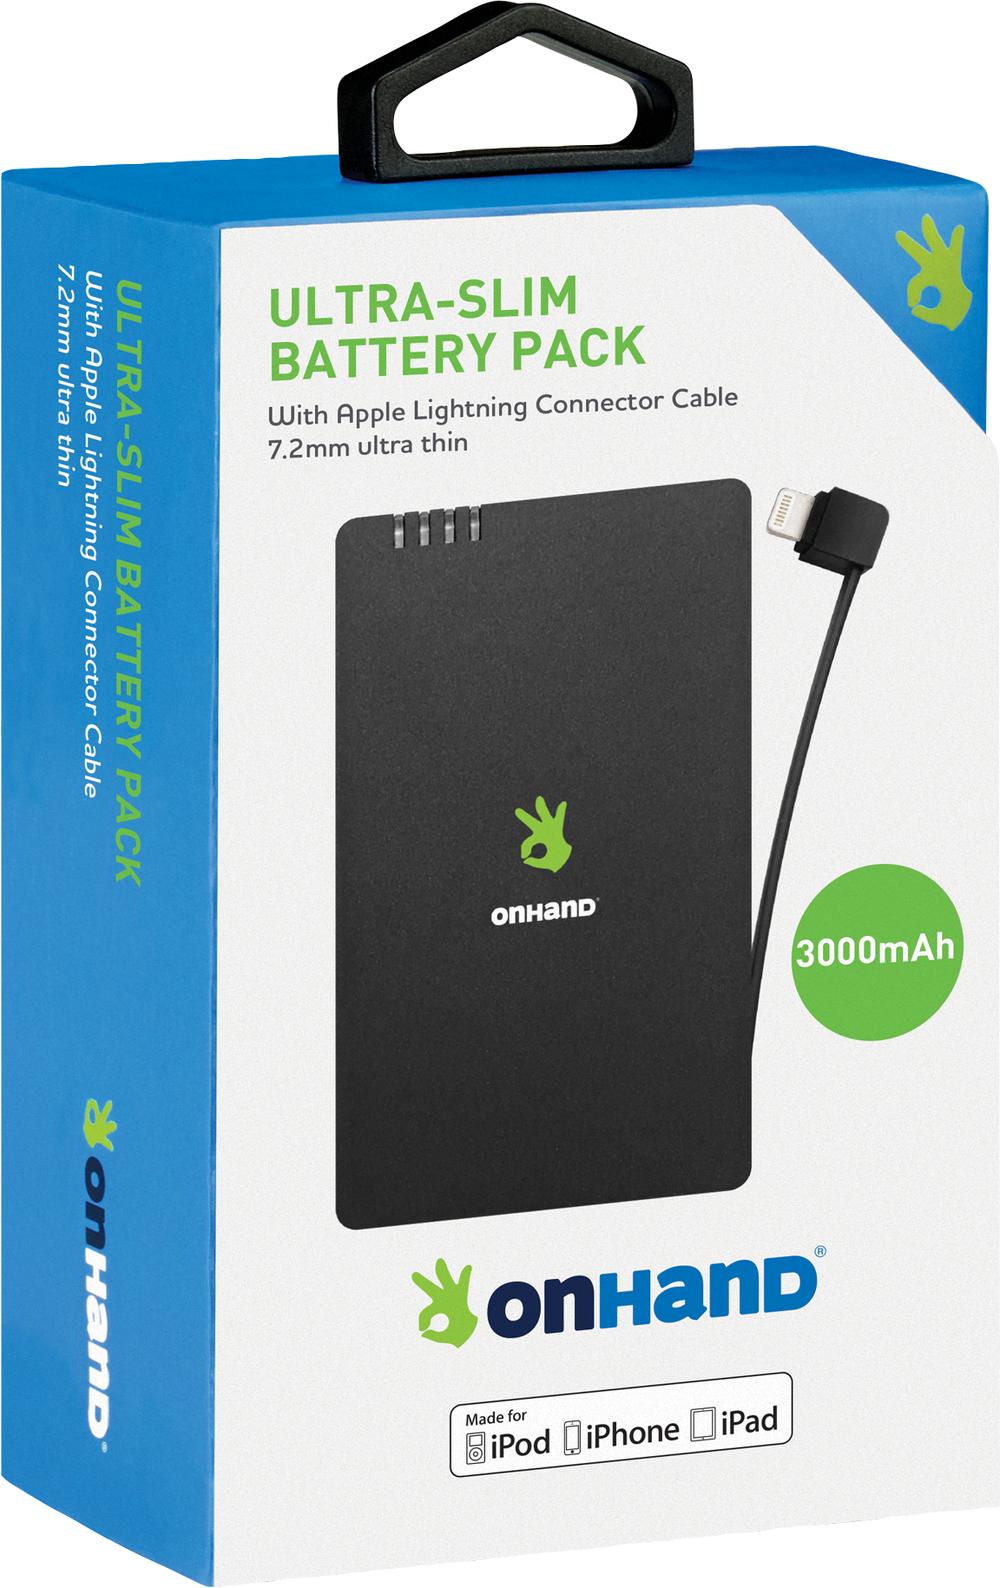 OnHand Ultra-Slim Battery Pack - Black 3000mAh BP